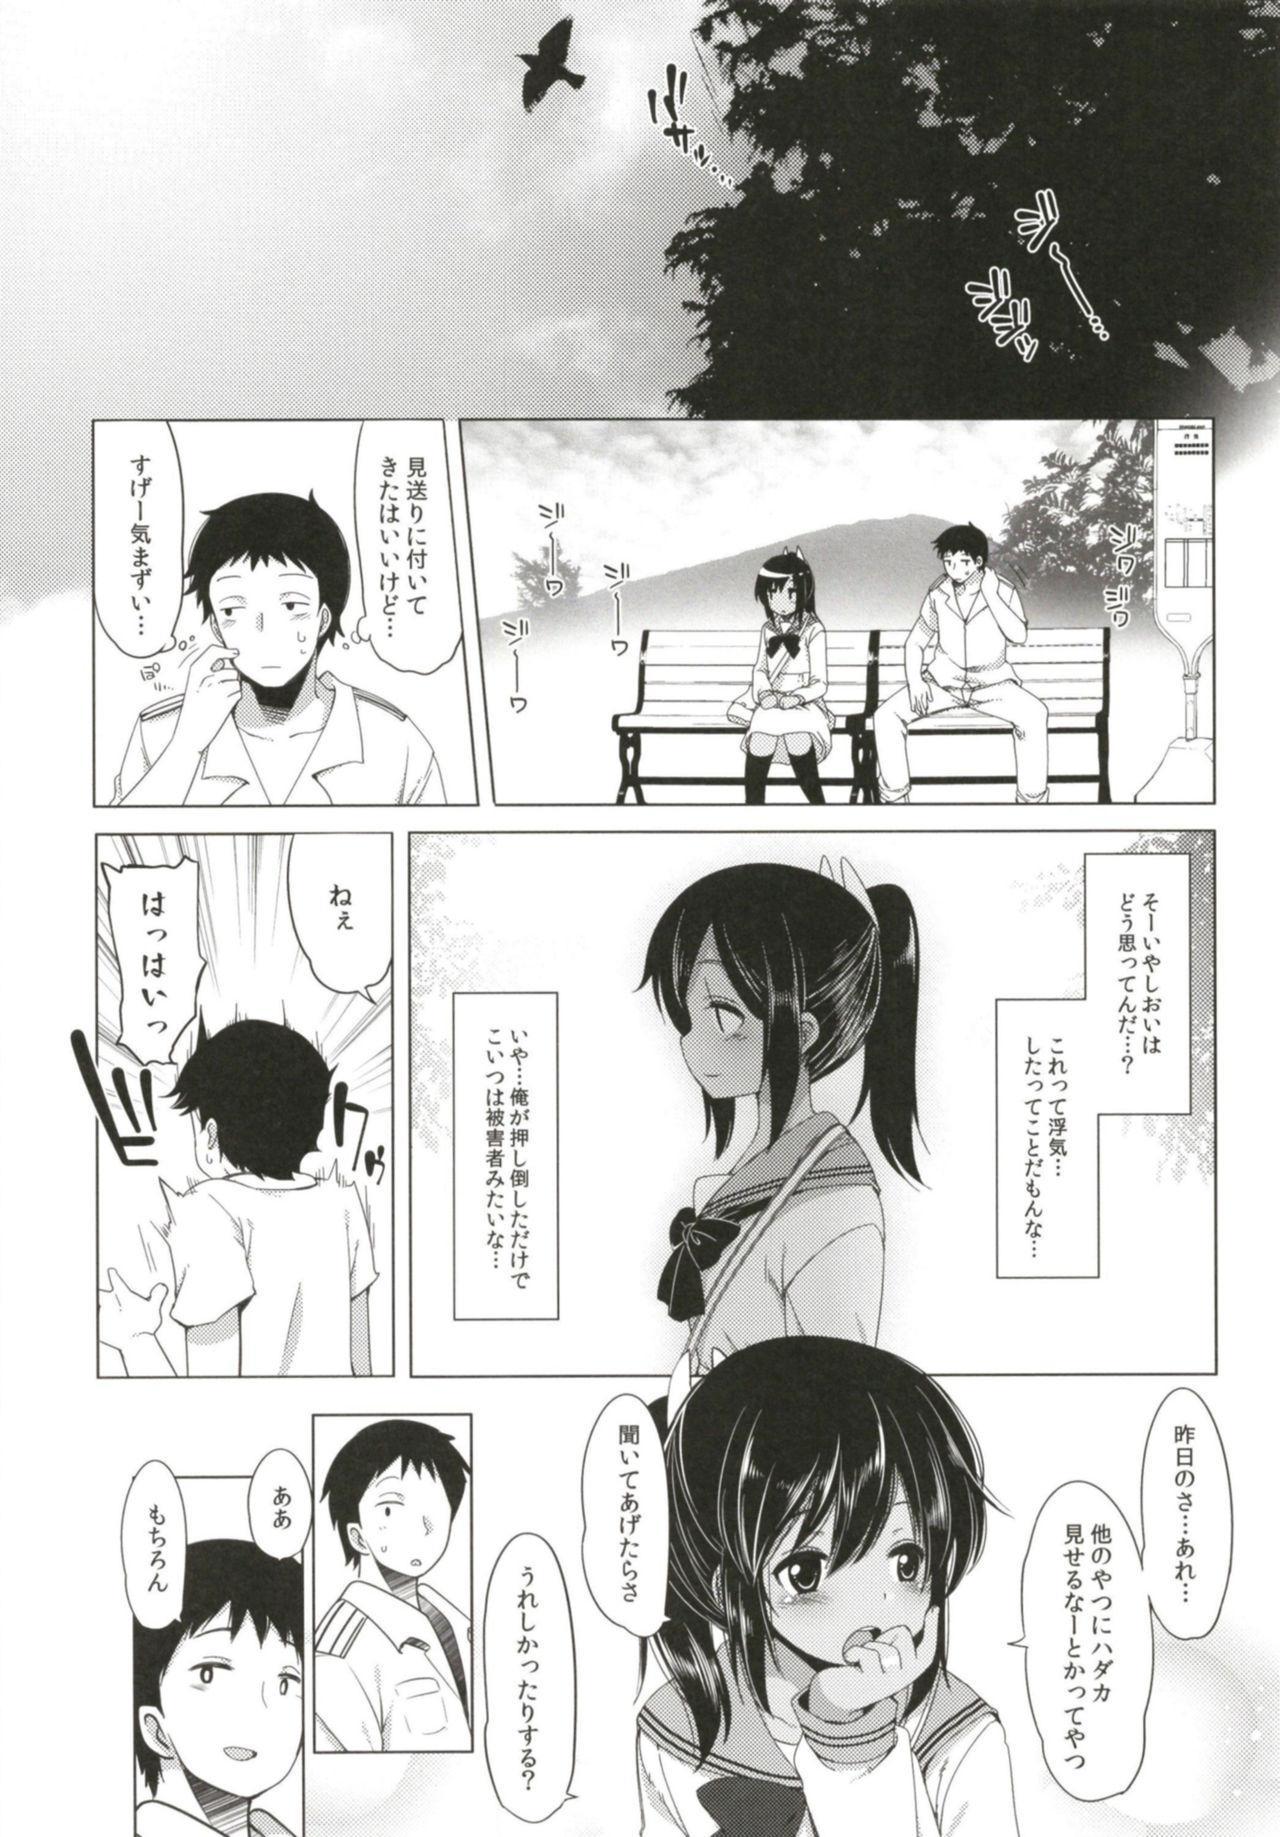 [French letter (Fujisaki Hikari)] Hitonatsu no Ayamachi -I-401 Soushuuhen- (Kantai Collection -KanColle-) [Digital] 29